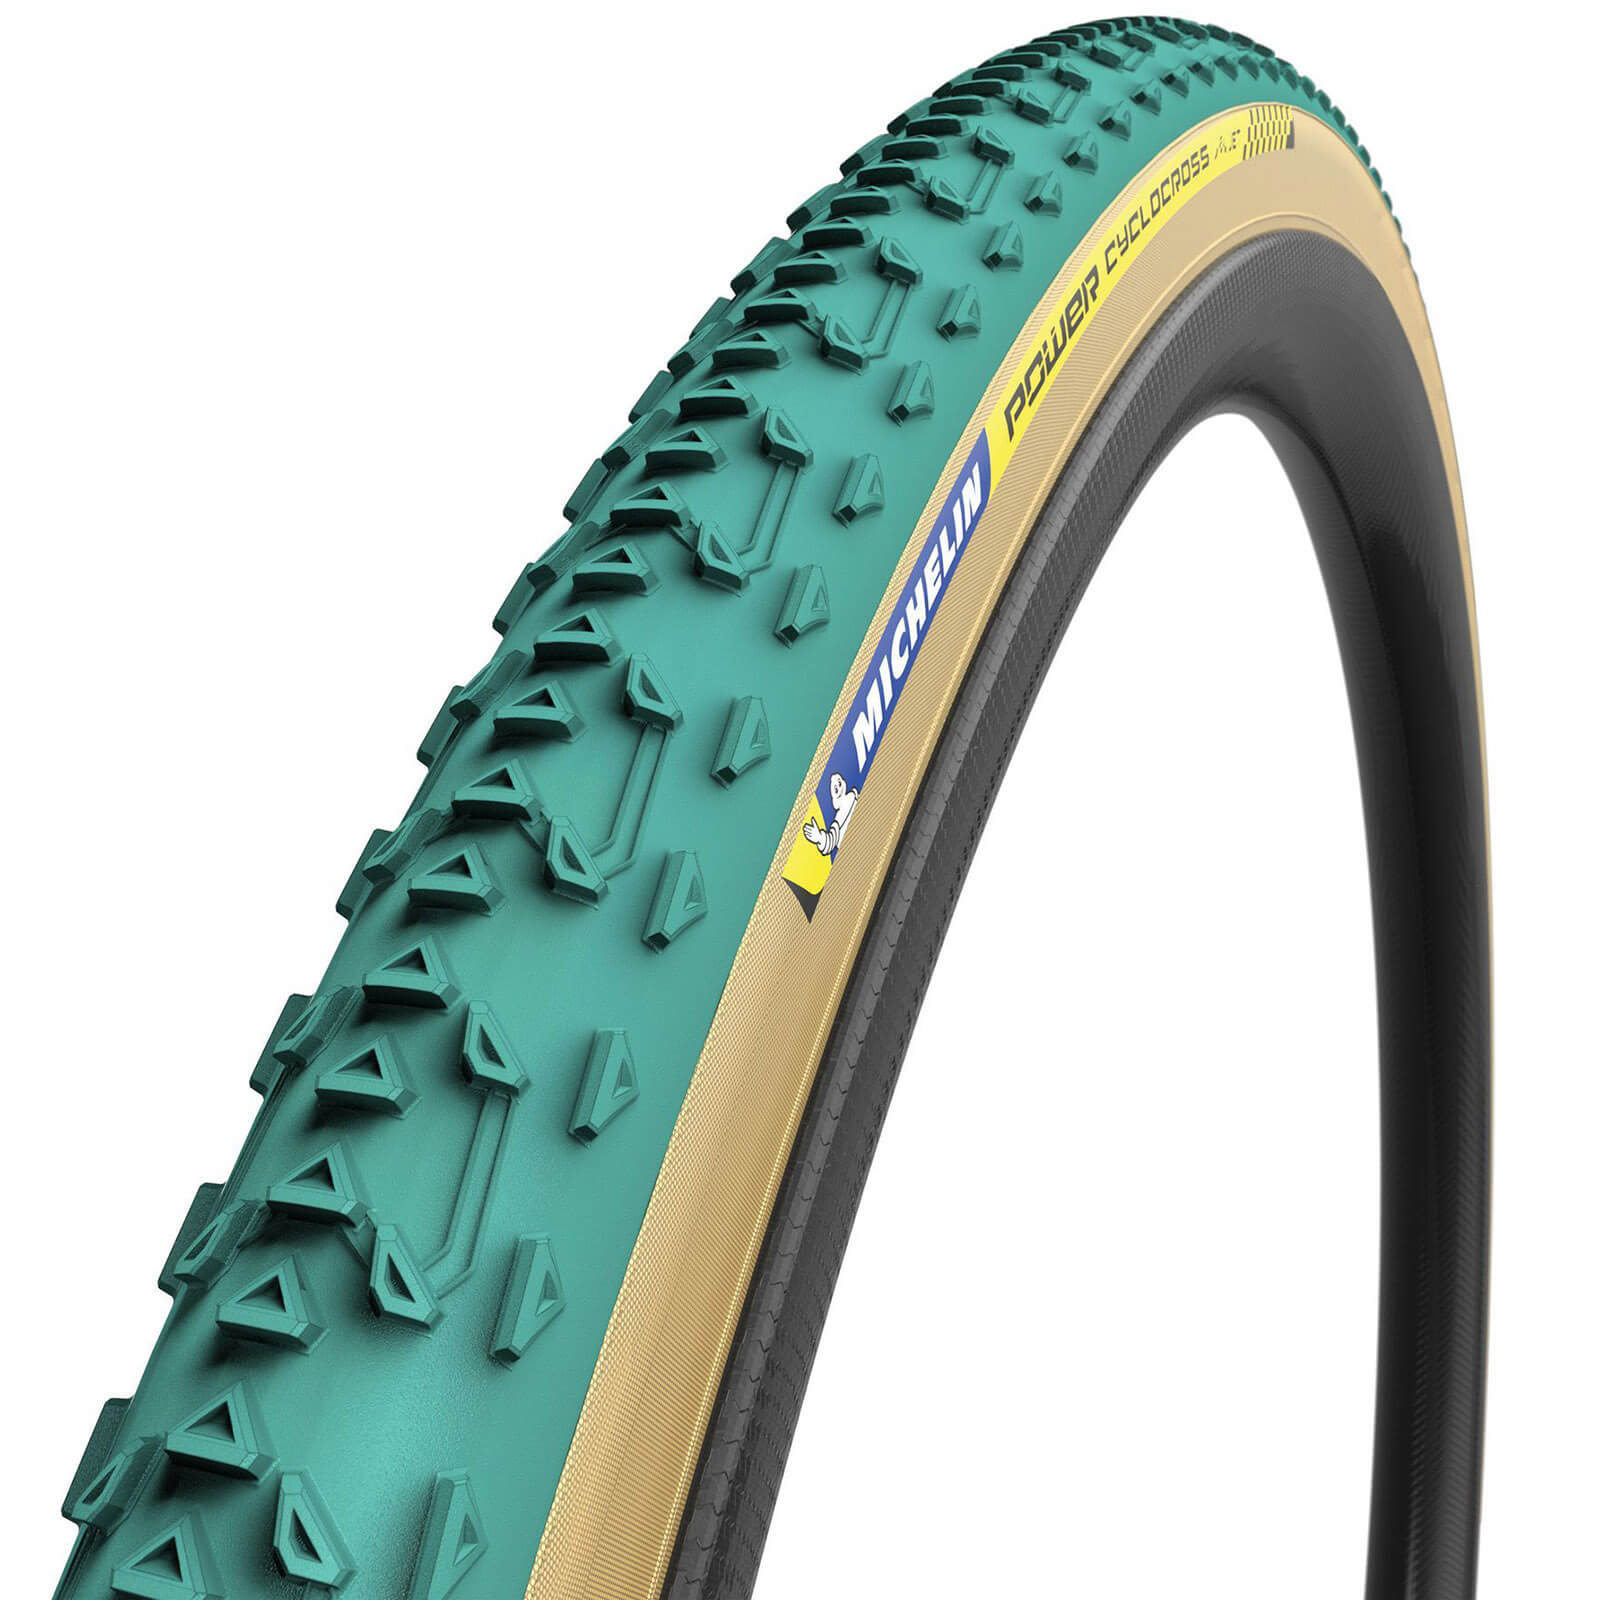 Michelin Power Jet Tubular Cyclocross Tyre - 700 x 33mm